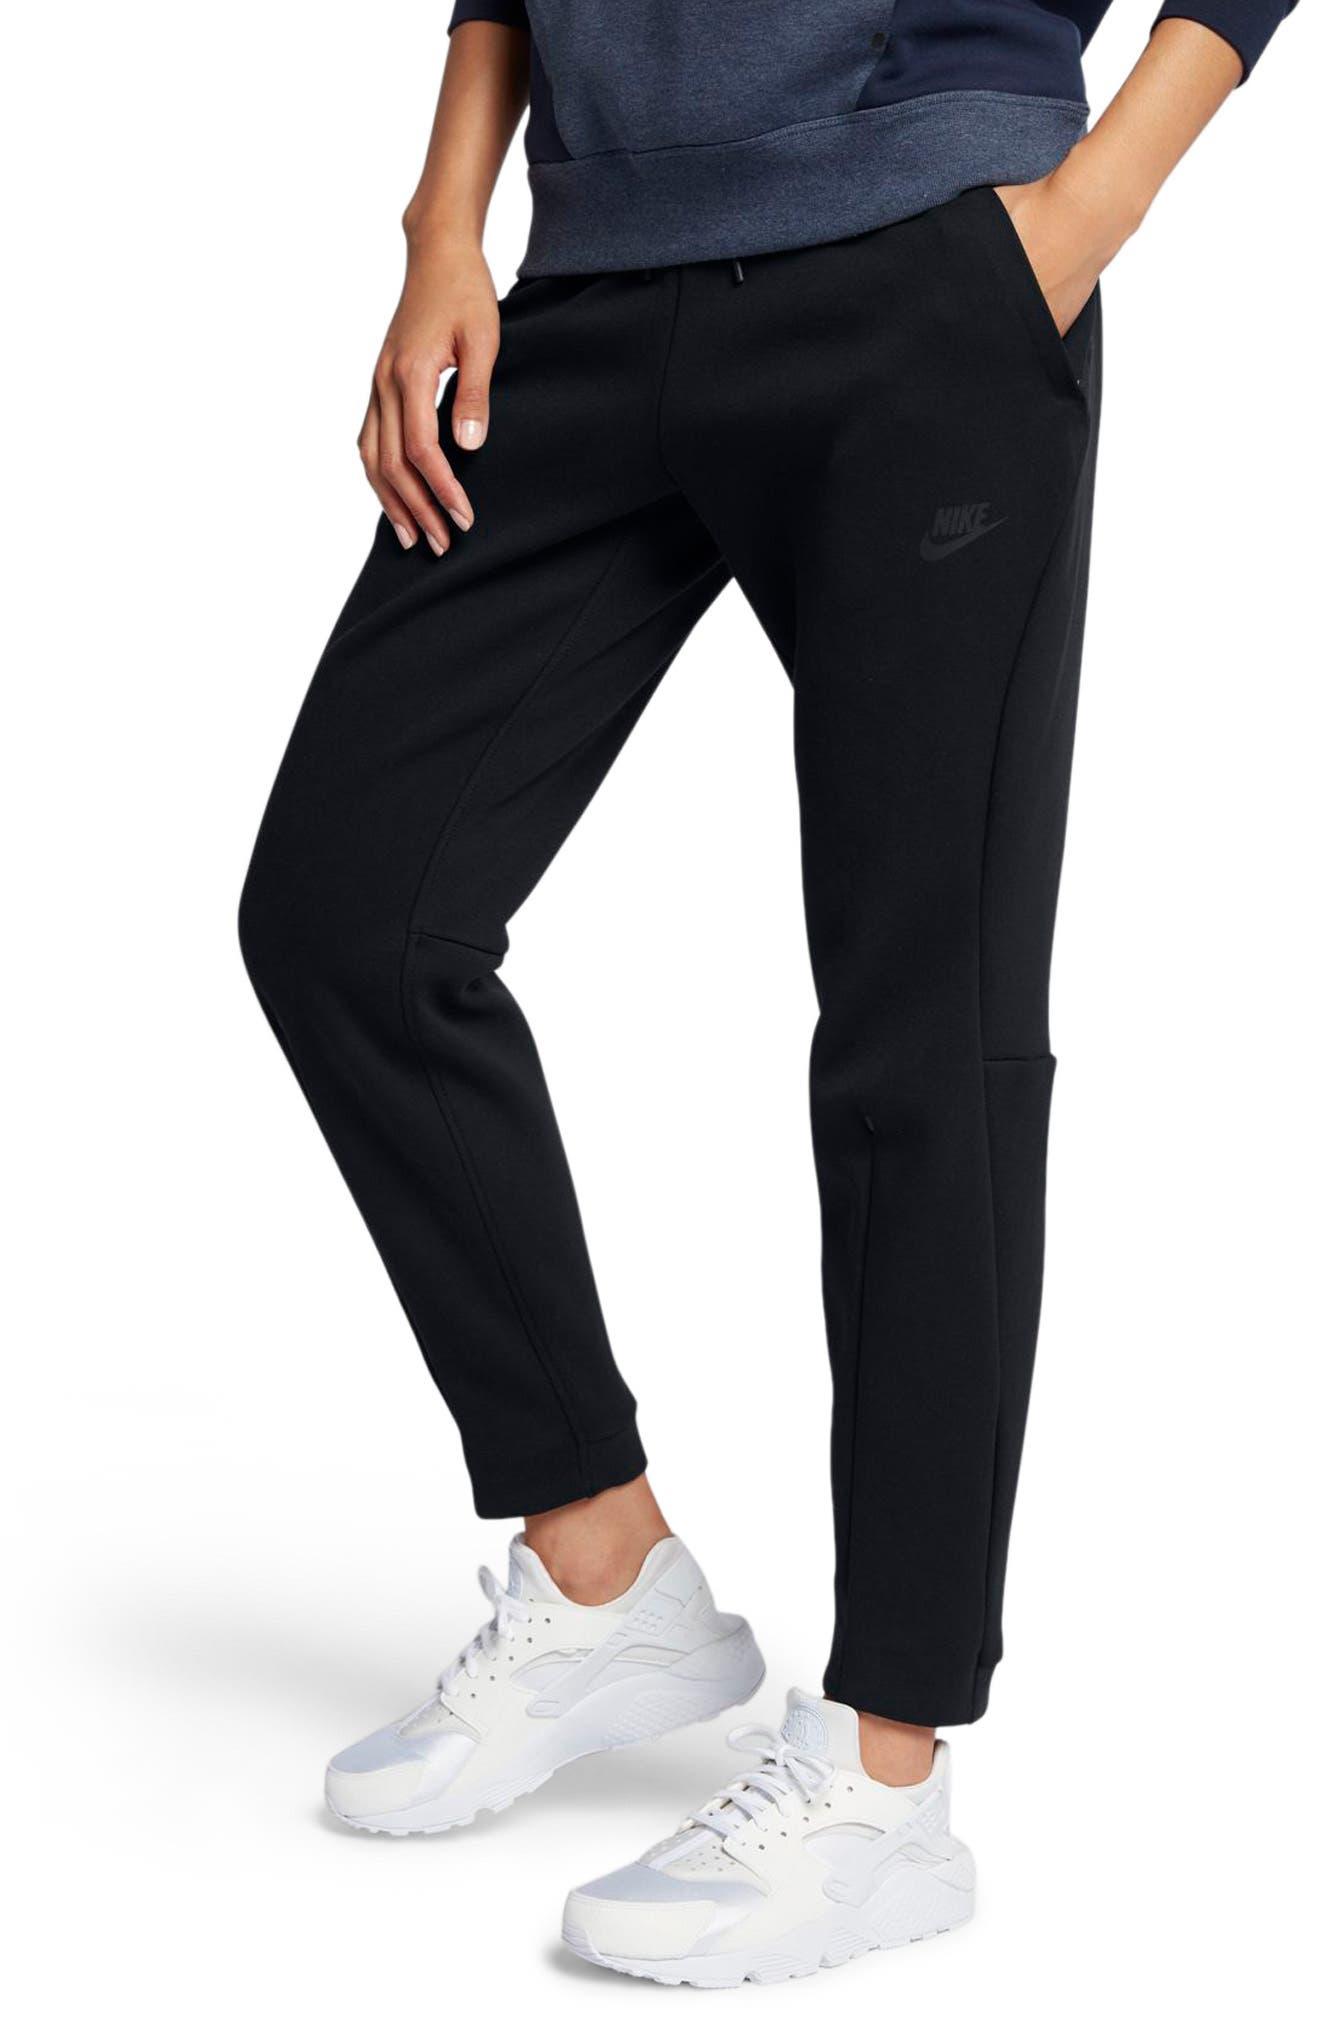 Sportswear Women's Tech Fleece Pants,                             Main thumbnail 1, color,                             010